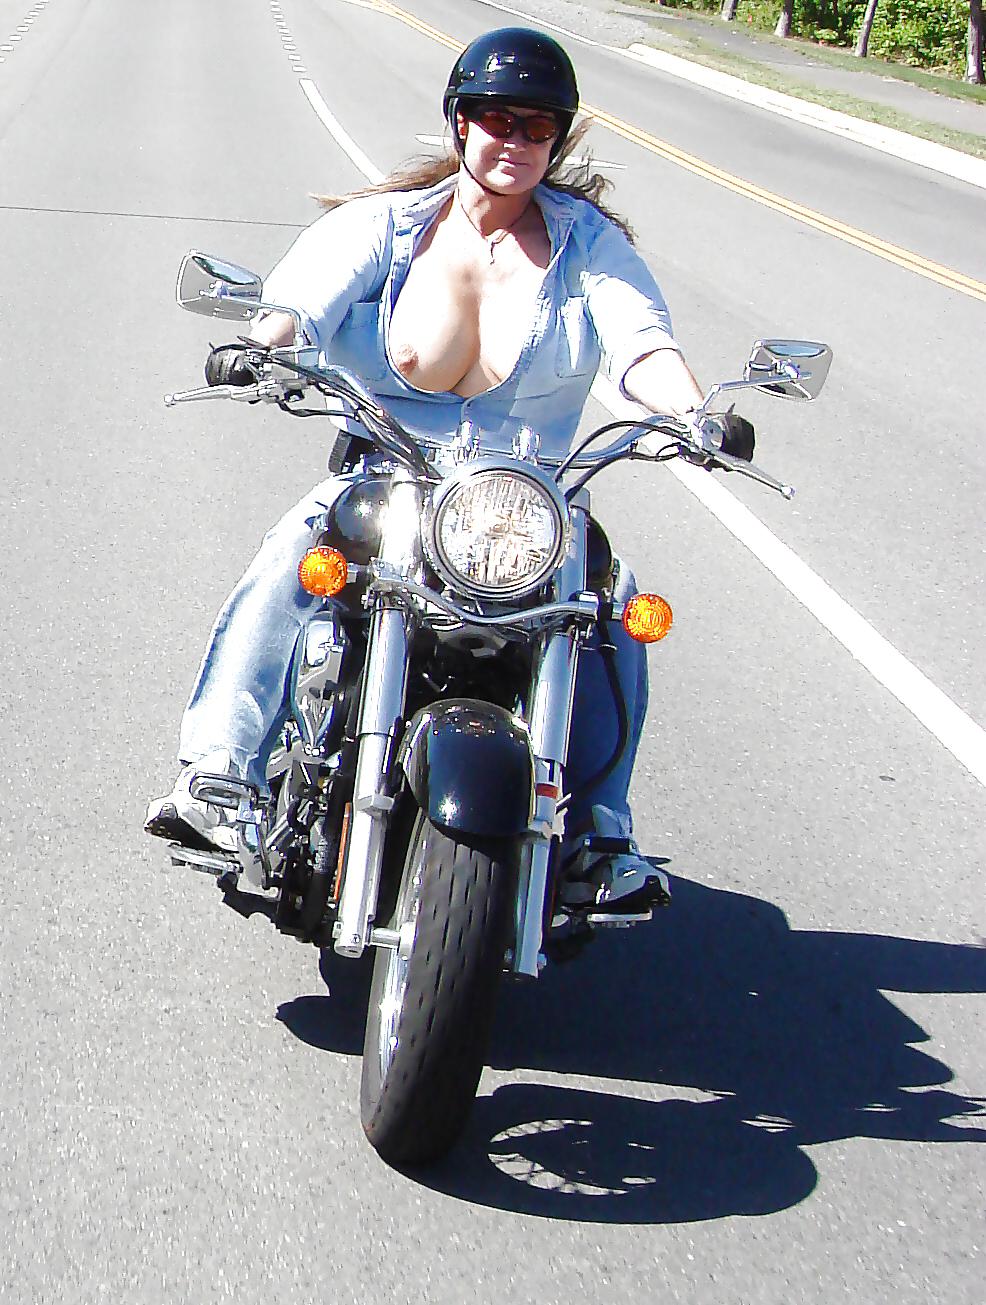 Amature sex bike boob pic